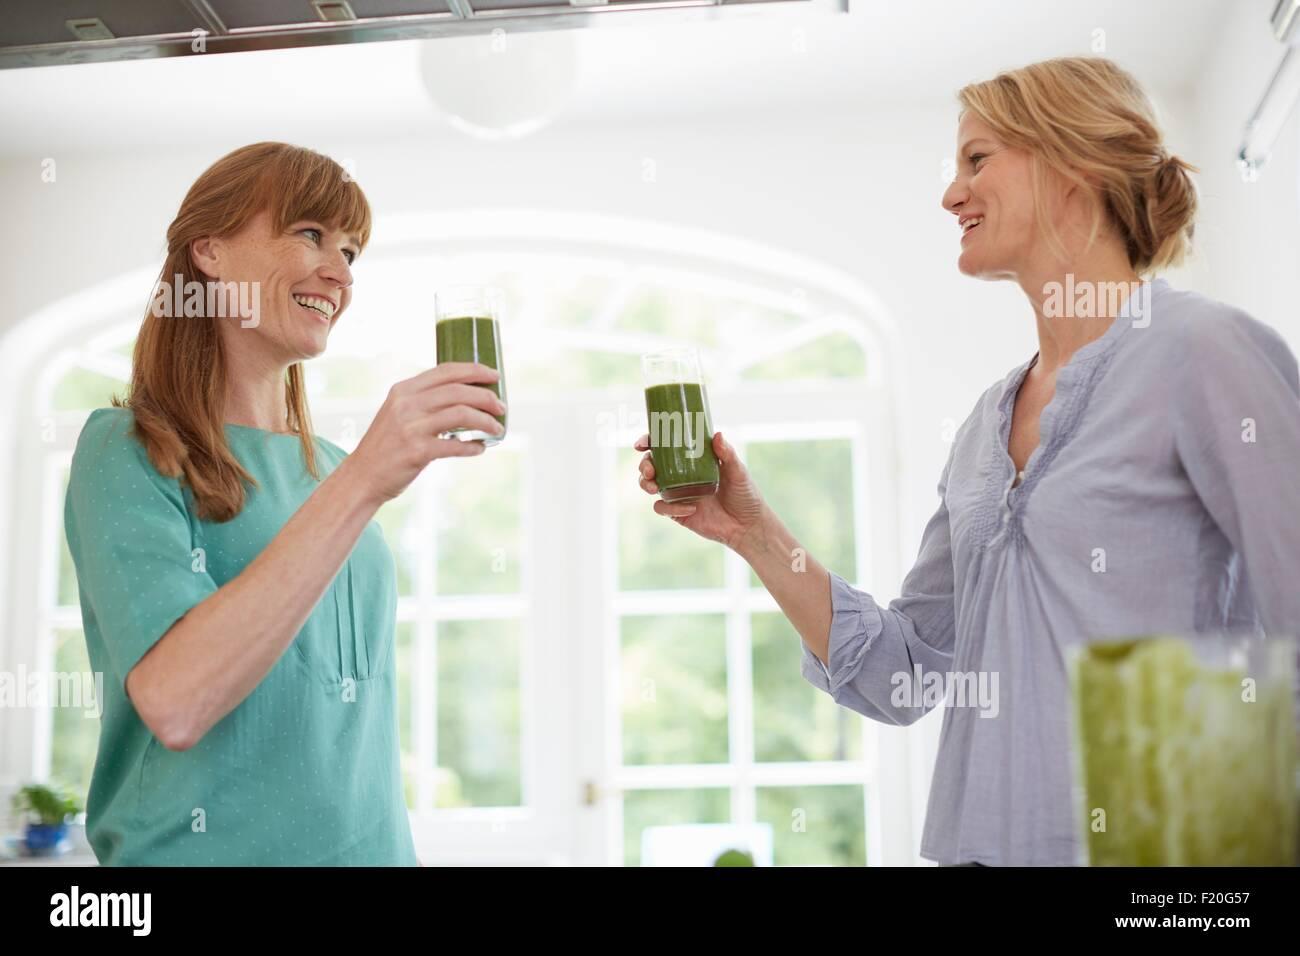 Frauen trinken grünen veganen Smoothie in Küche Stockbild